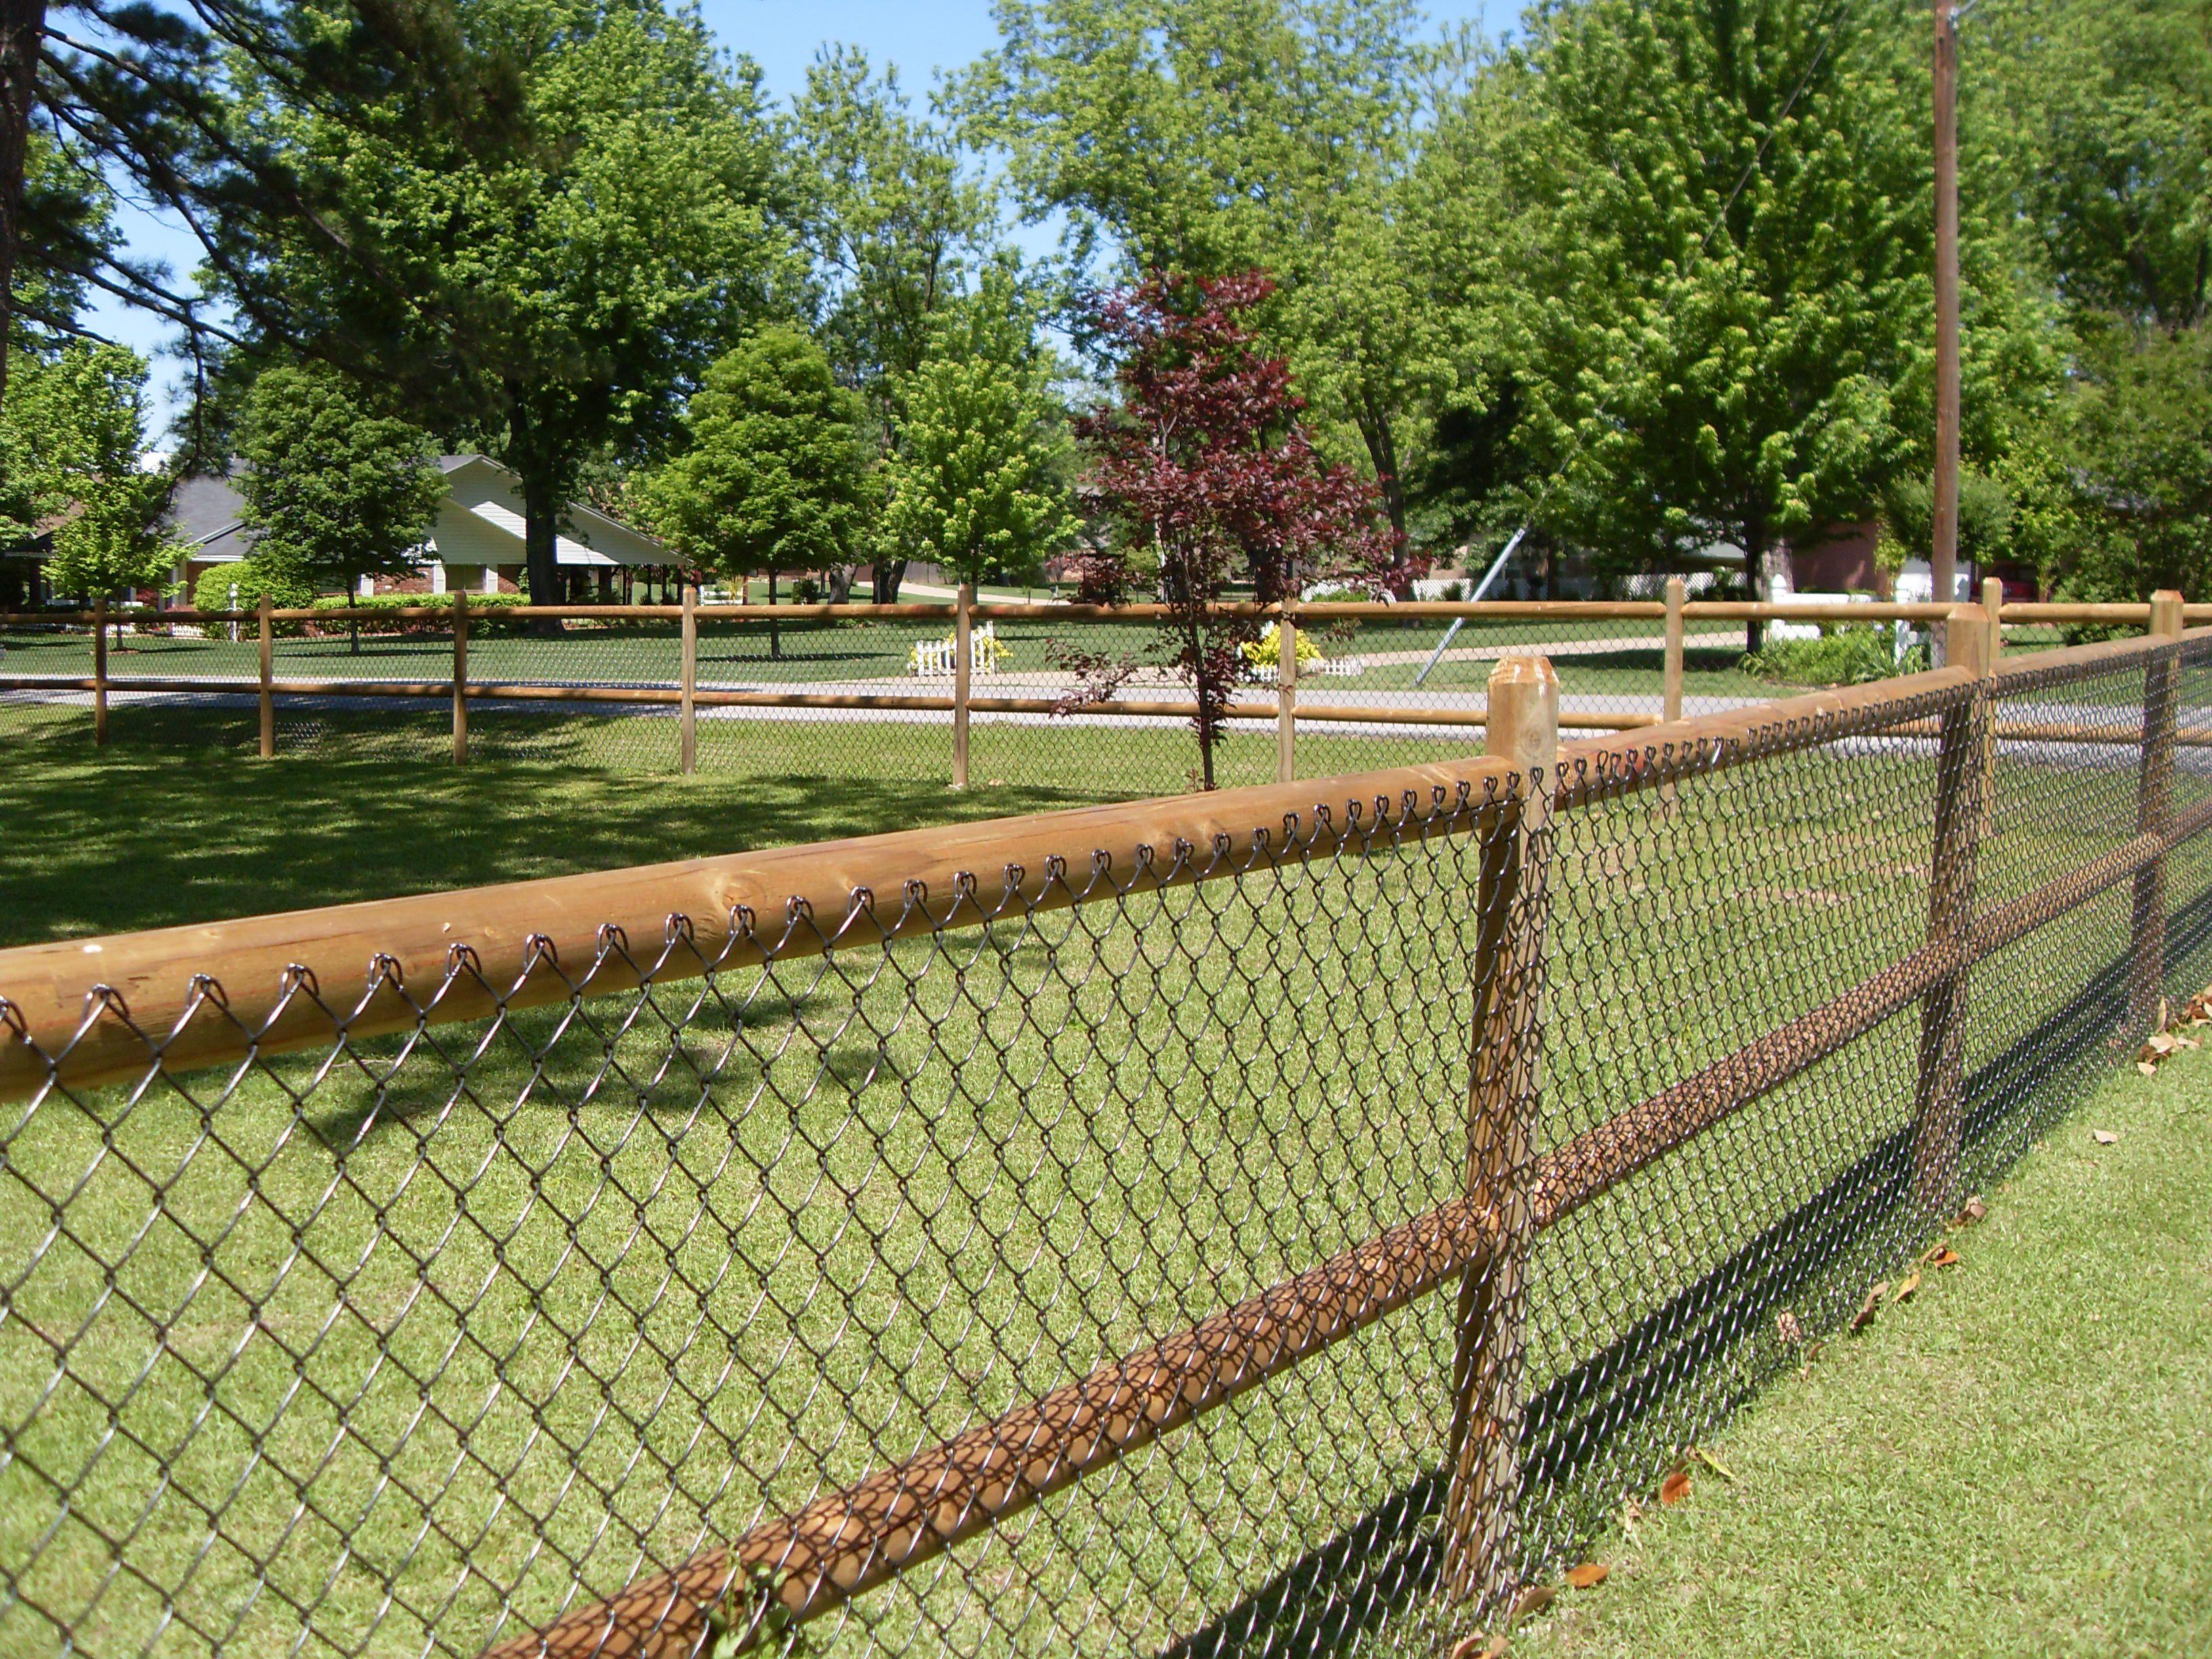 2 Rail Wood Fence With Chain Link Backyard Fences Wood